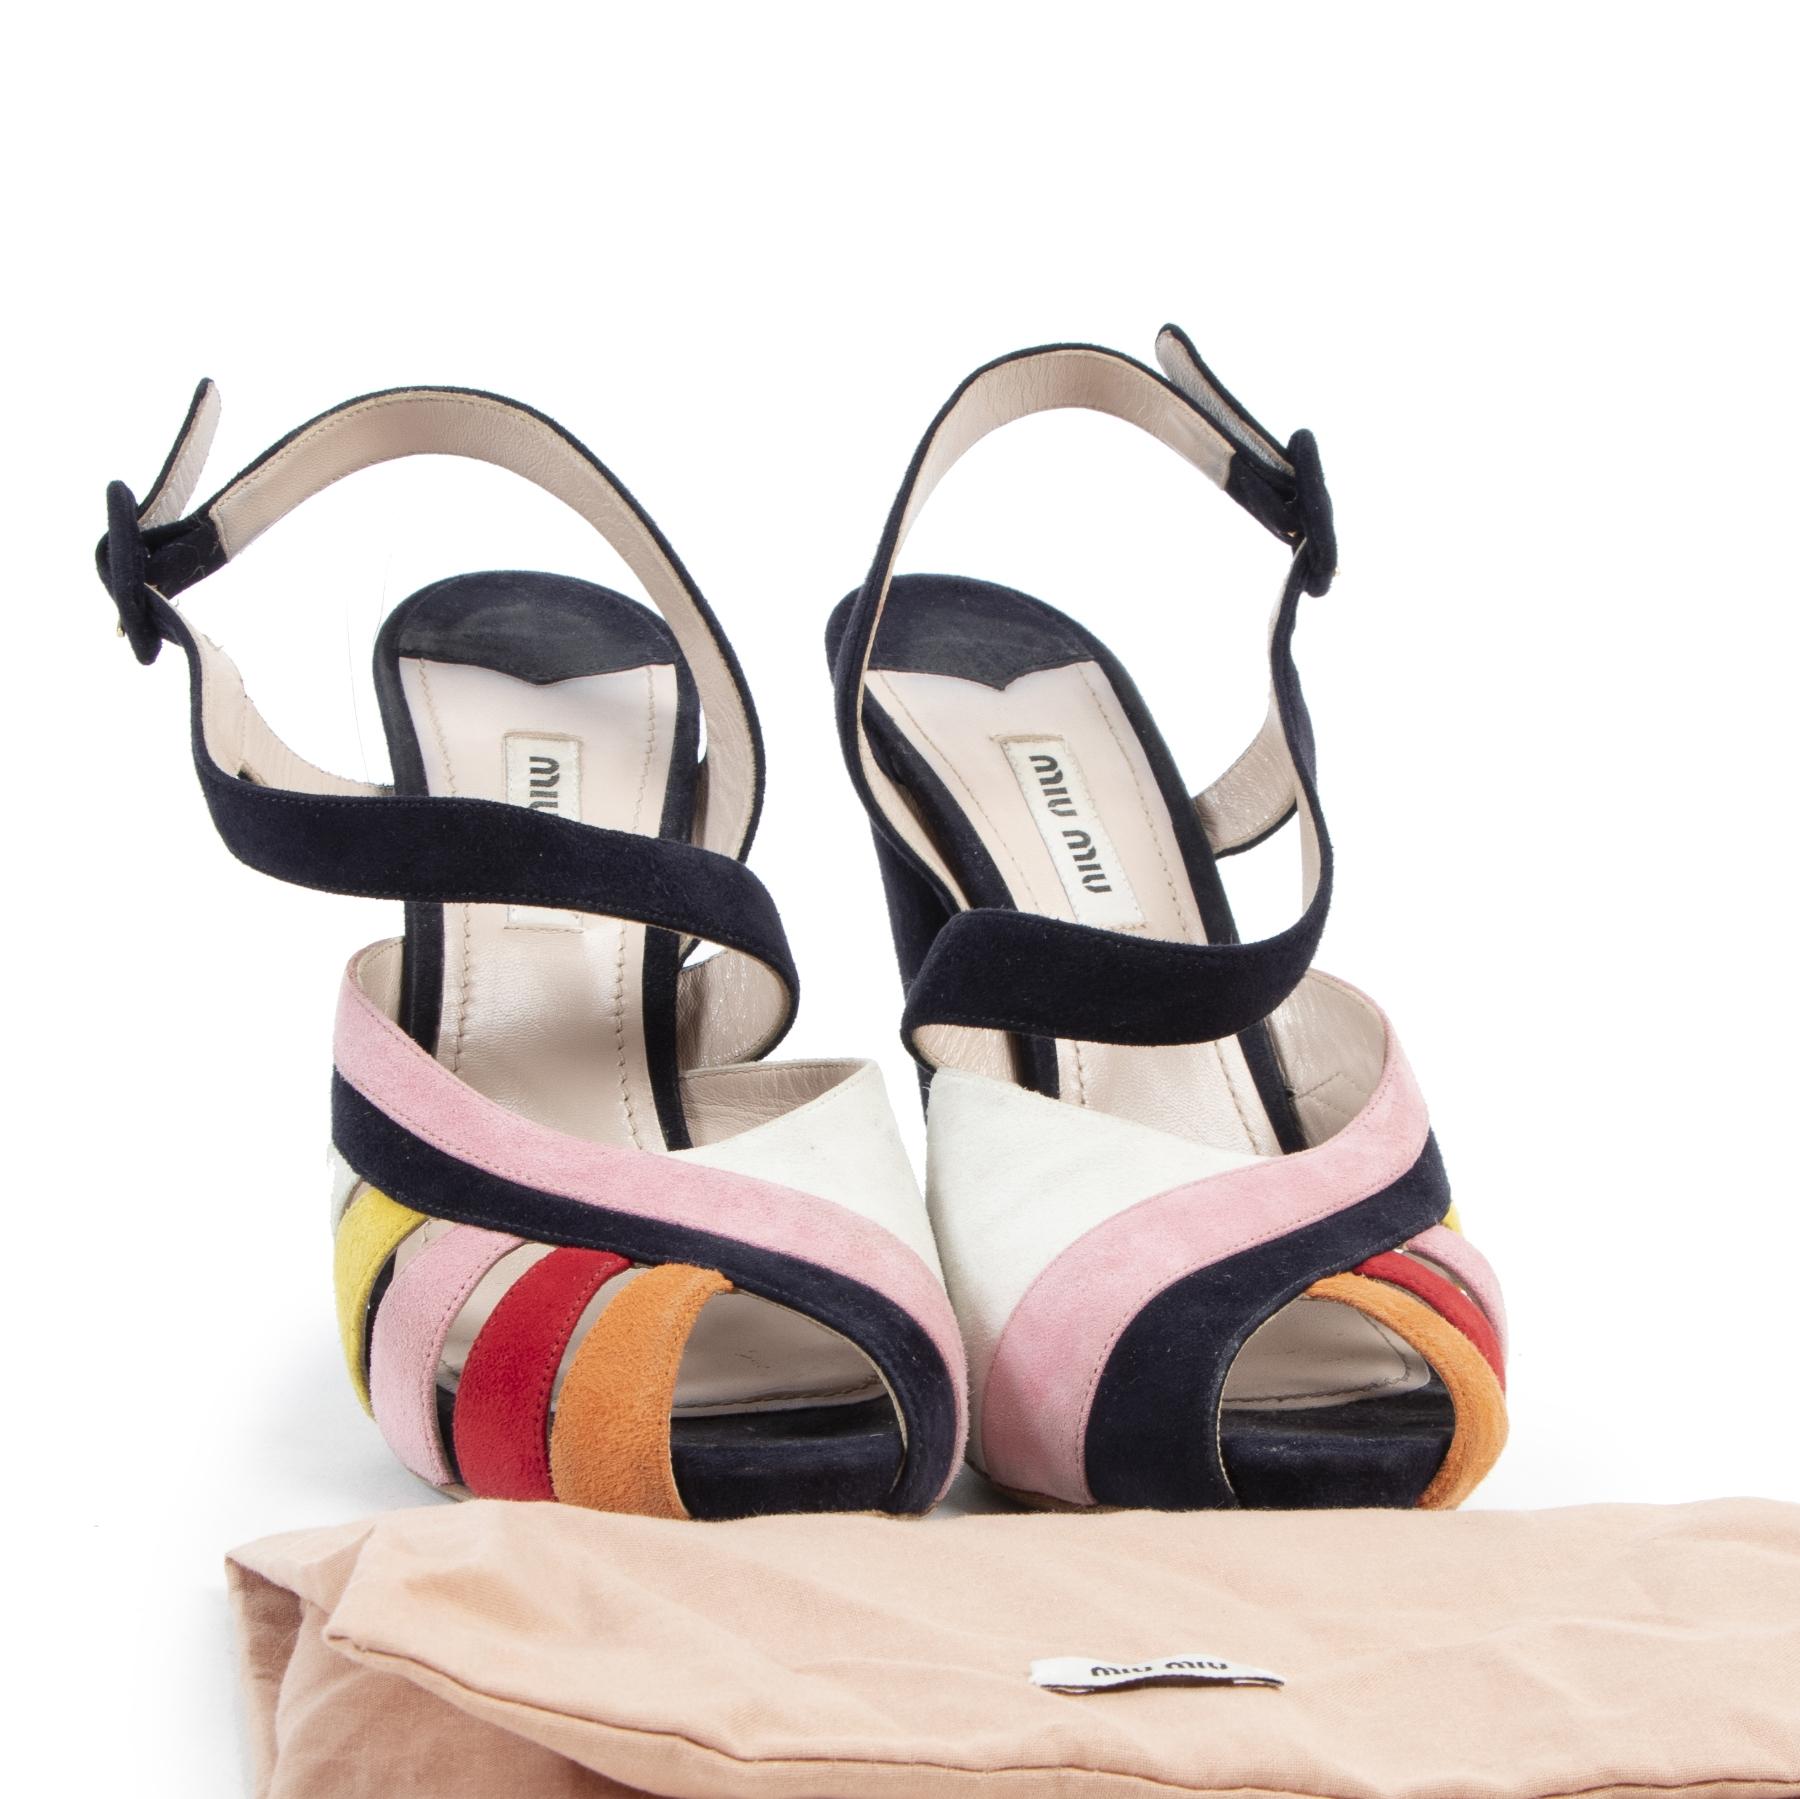 Buy preloved Miu Miu heels at LabelLOV Antwerp.